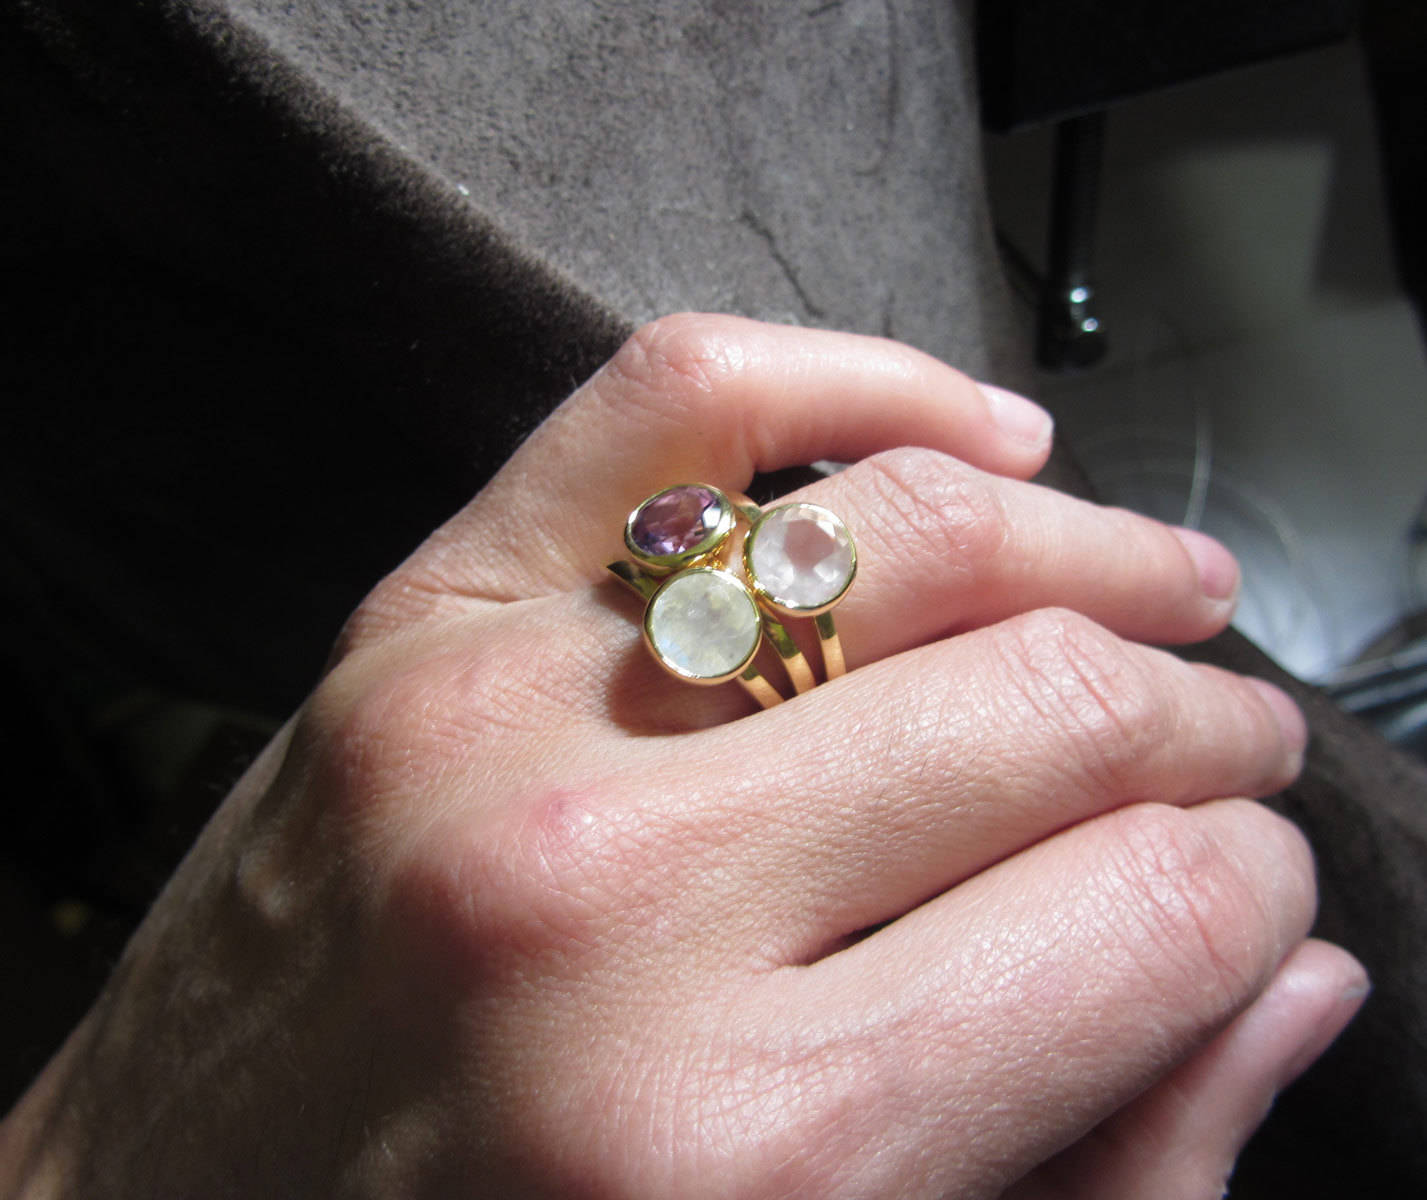 Bague Amethyste en or jaune 18 carats, fait main artisanal